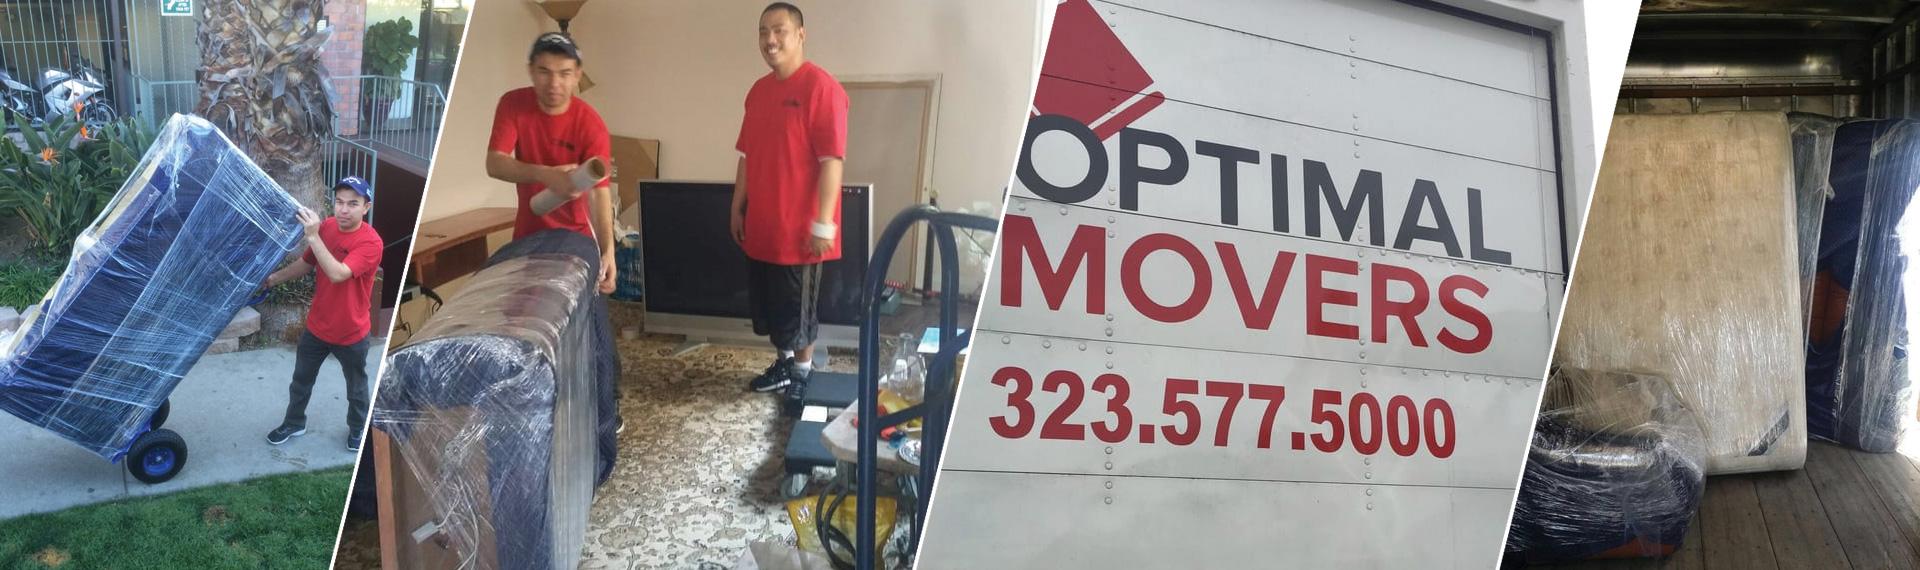 Optimal Movers